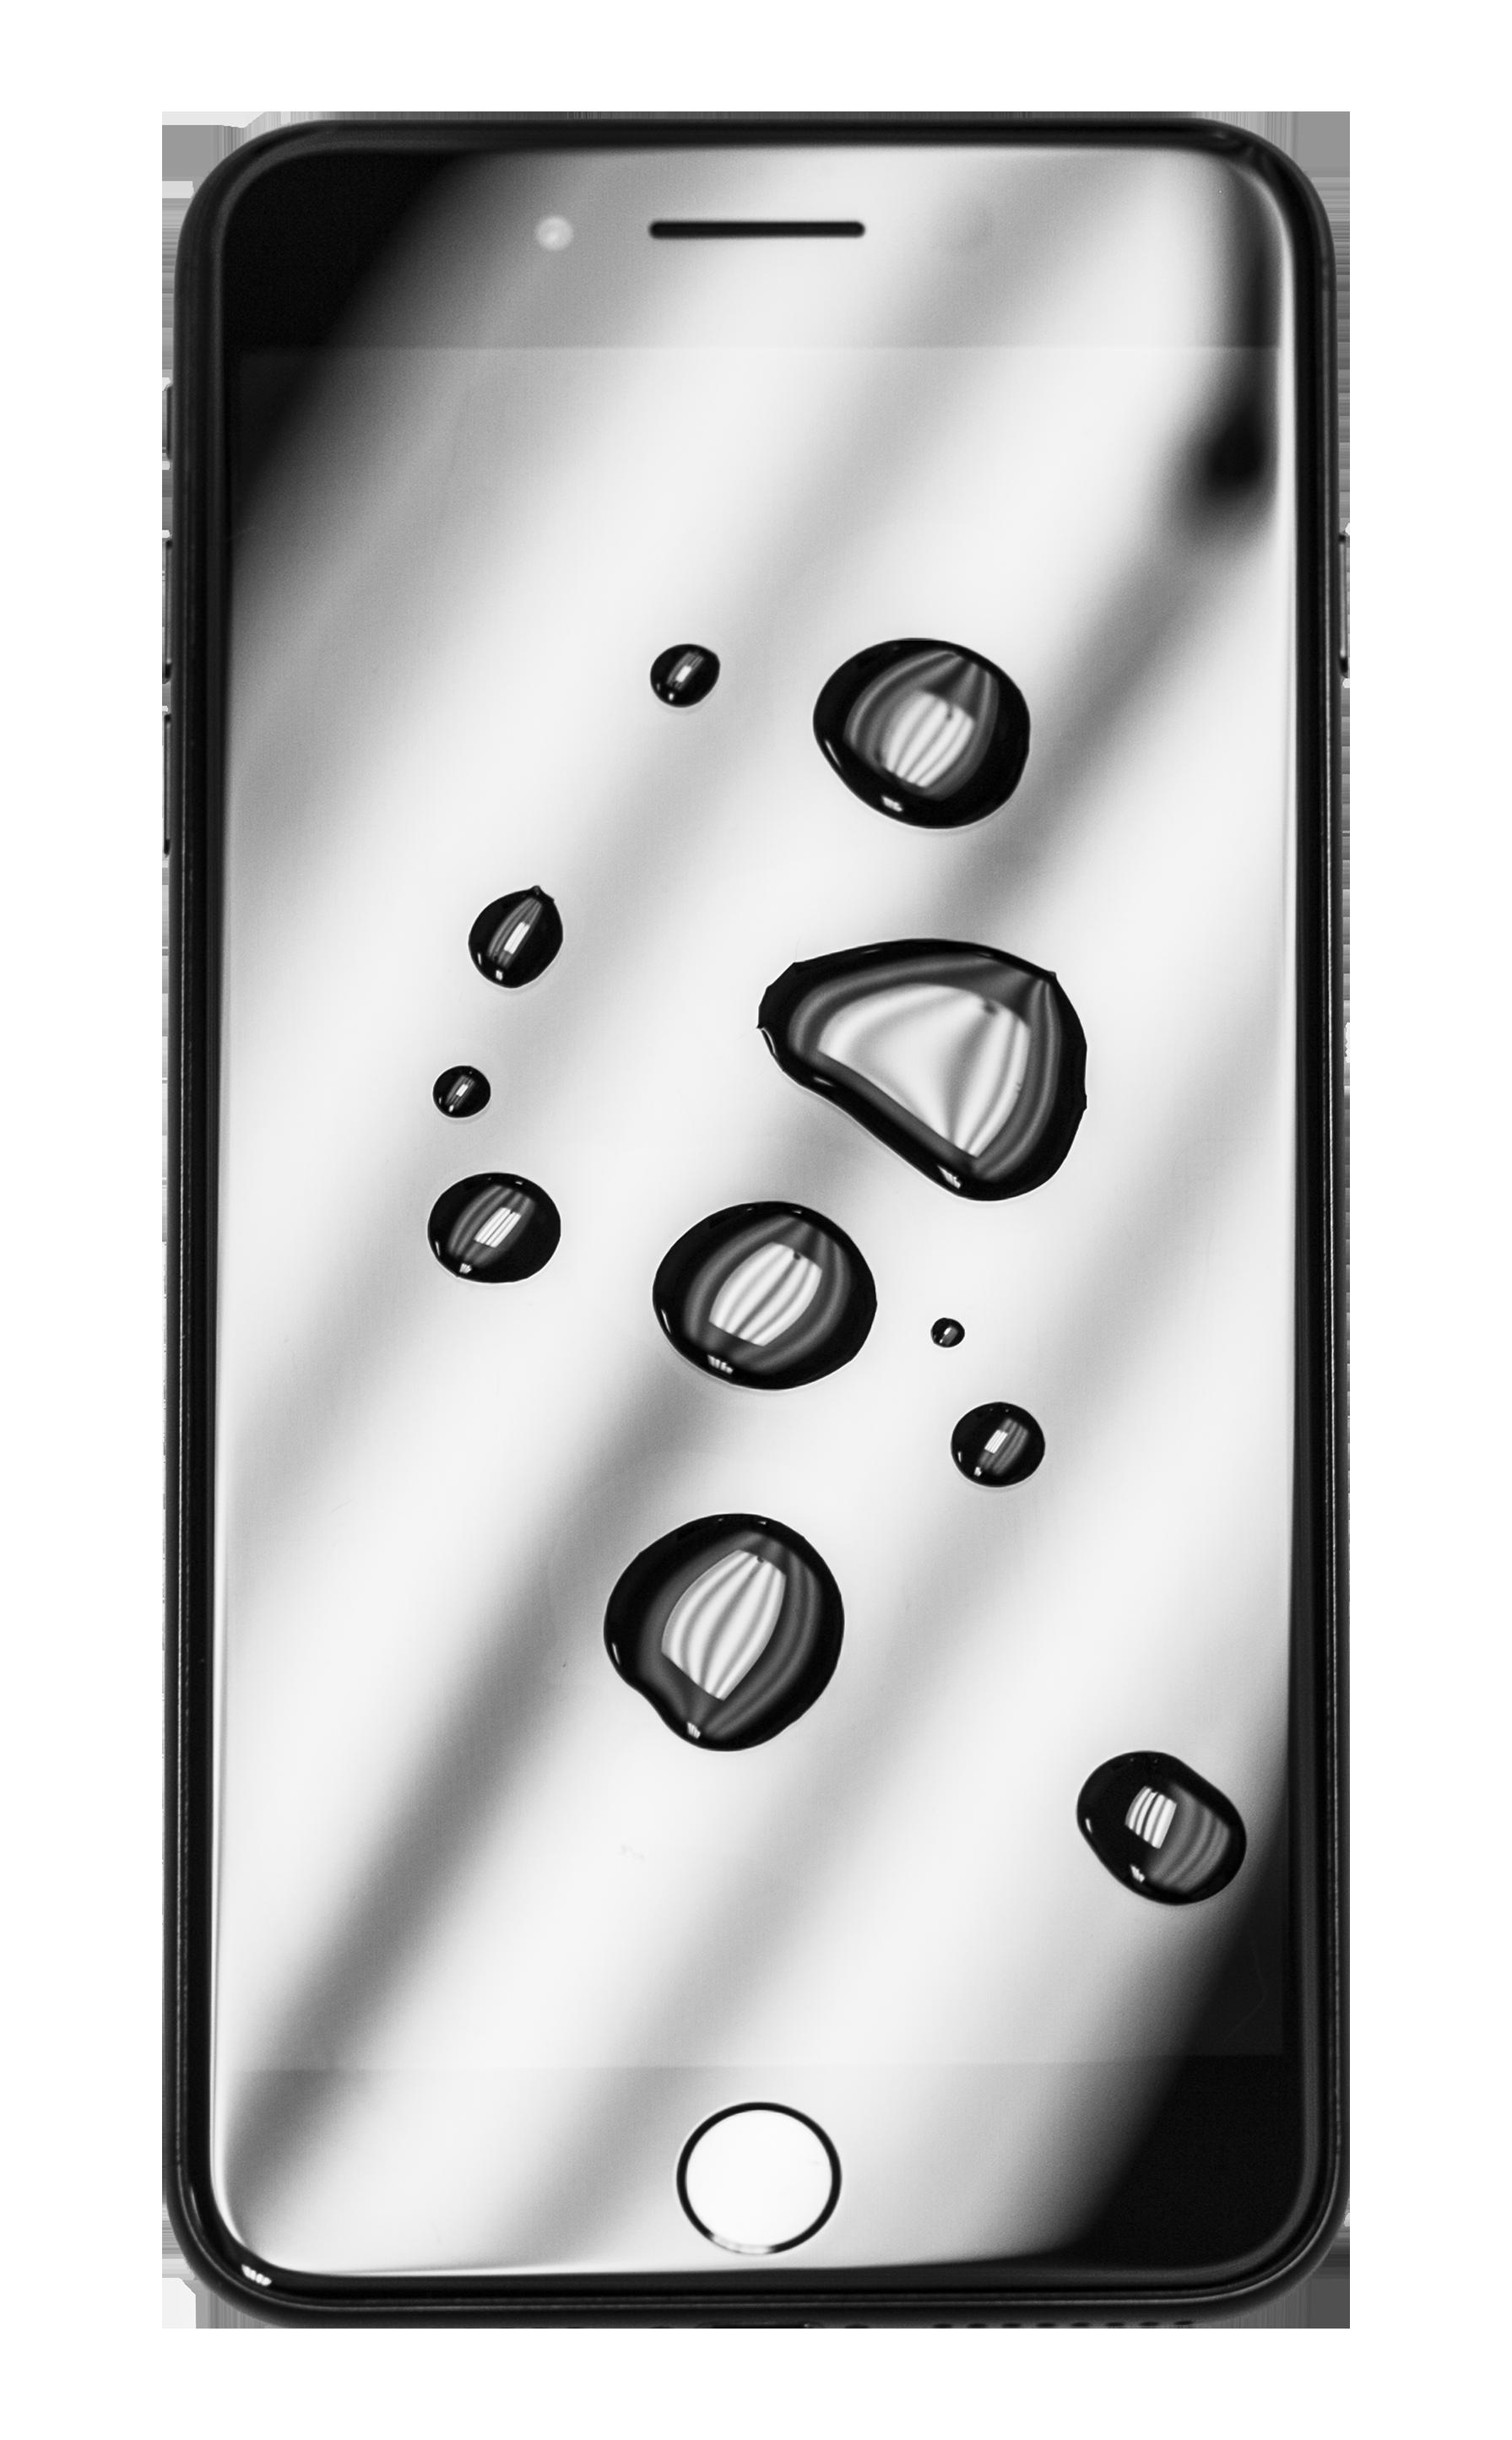 cellhelmet-liquid-glass-screen-protection